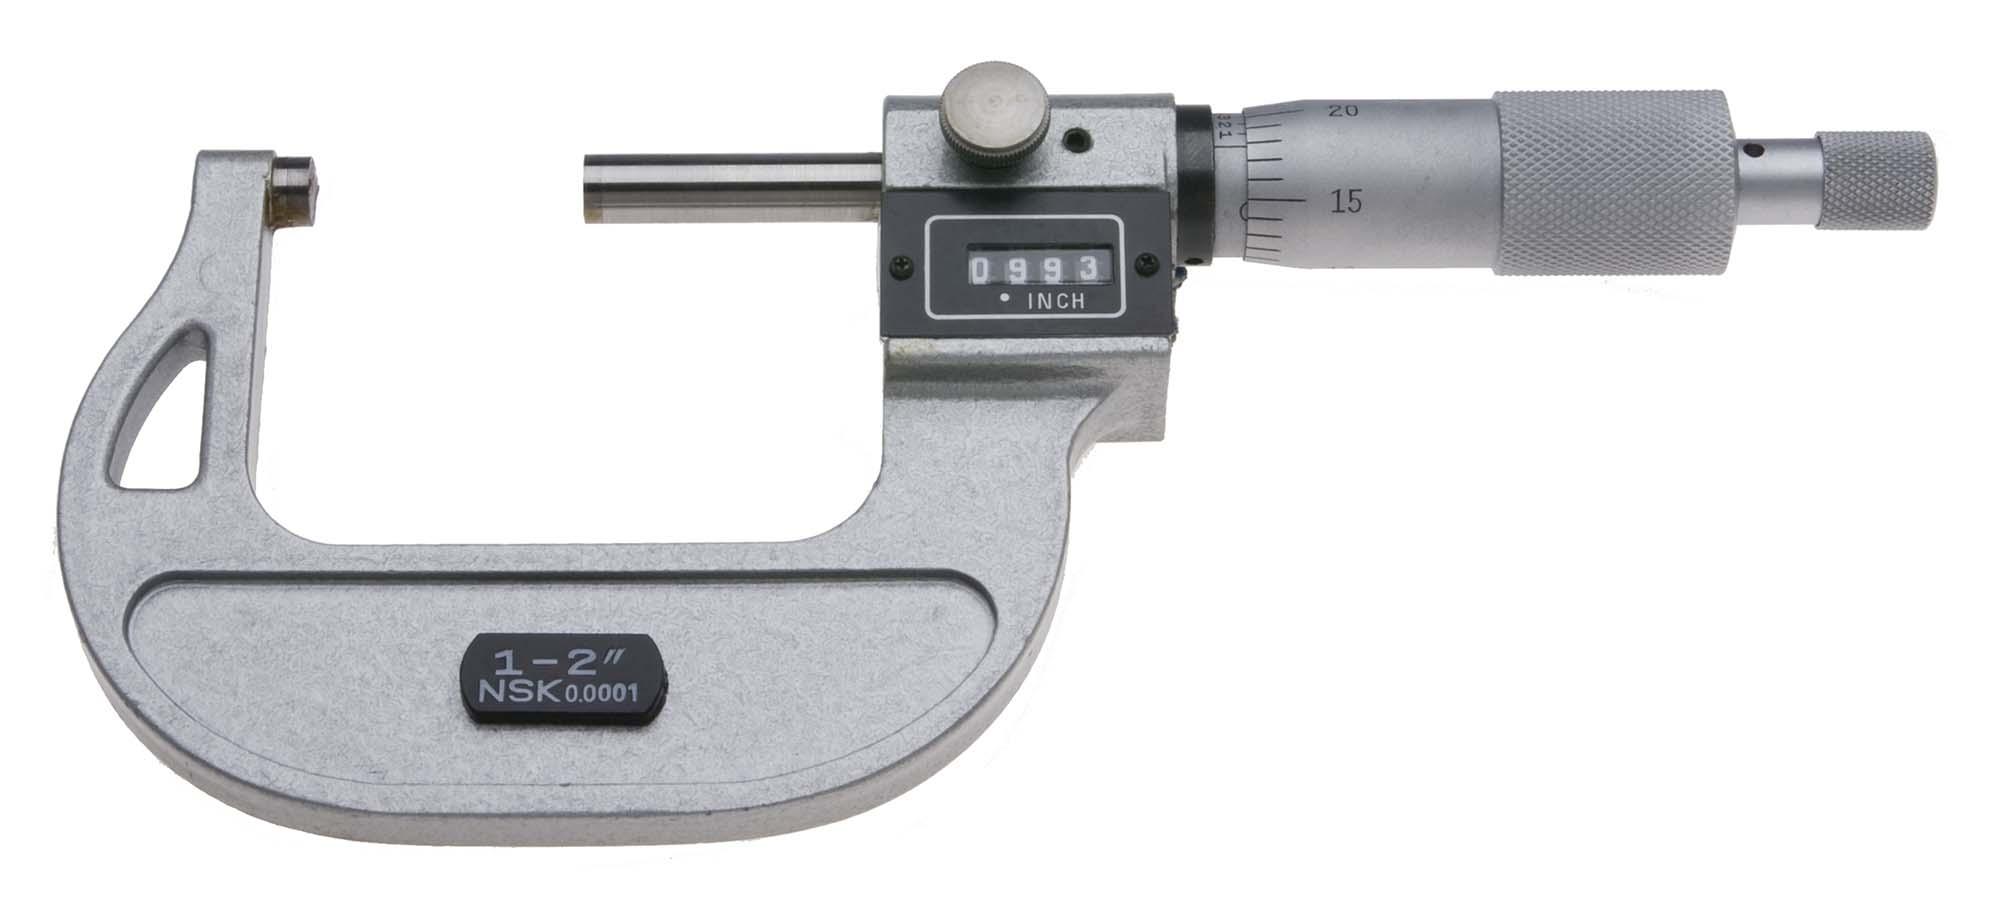 "1-2"" NSK Digital Micrometer"